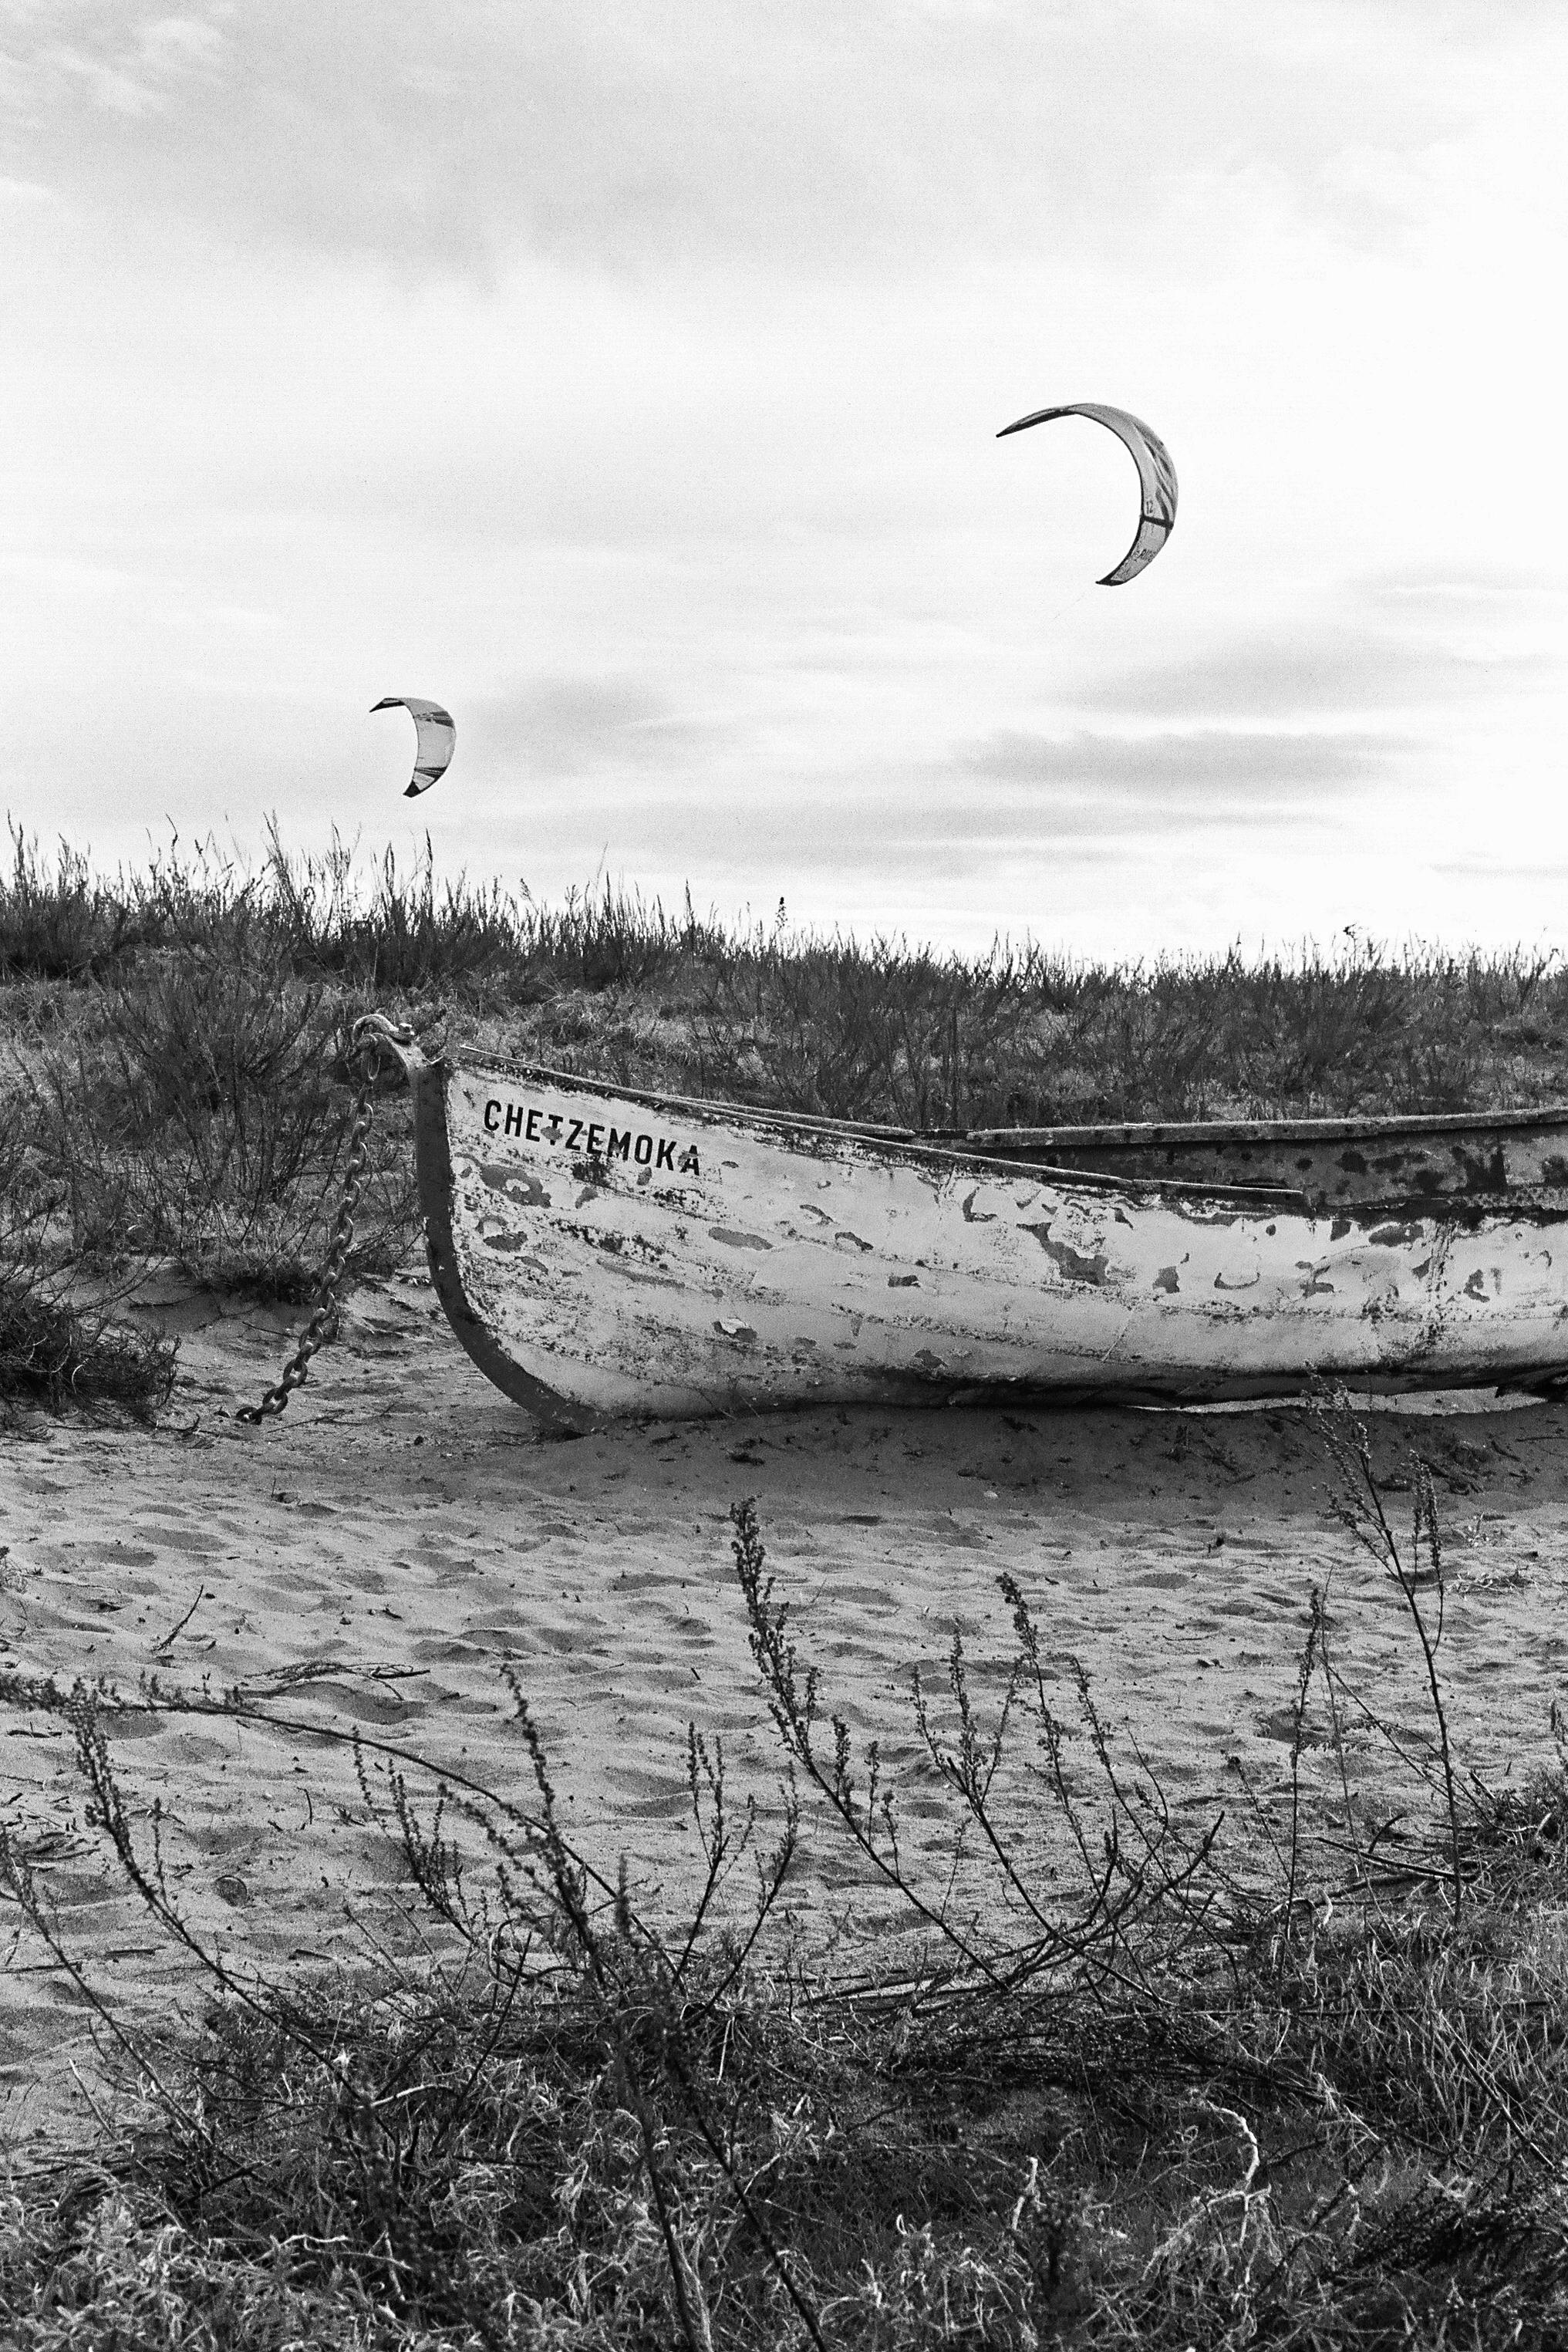 Port Townsend, Washington © 2017.  Image: Leica M6 Classic + Leitz Summilux Pre-ASPH 1.4/50mm.